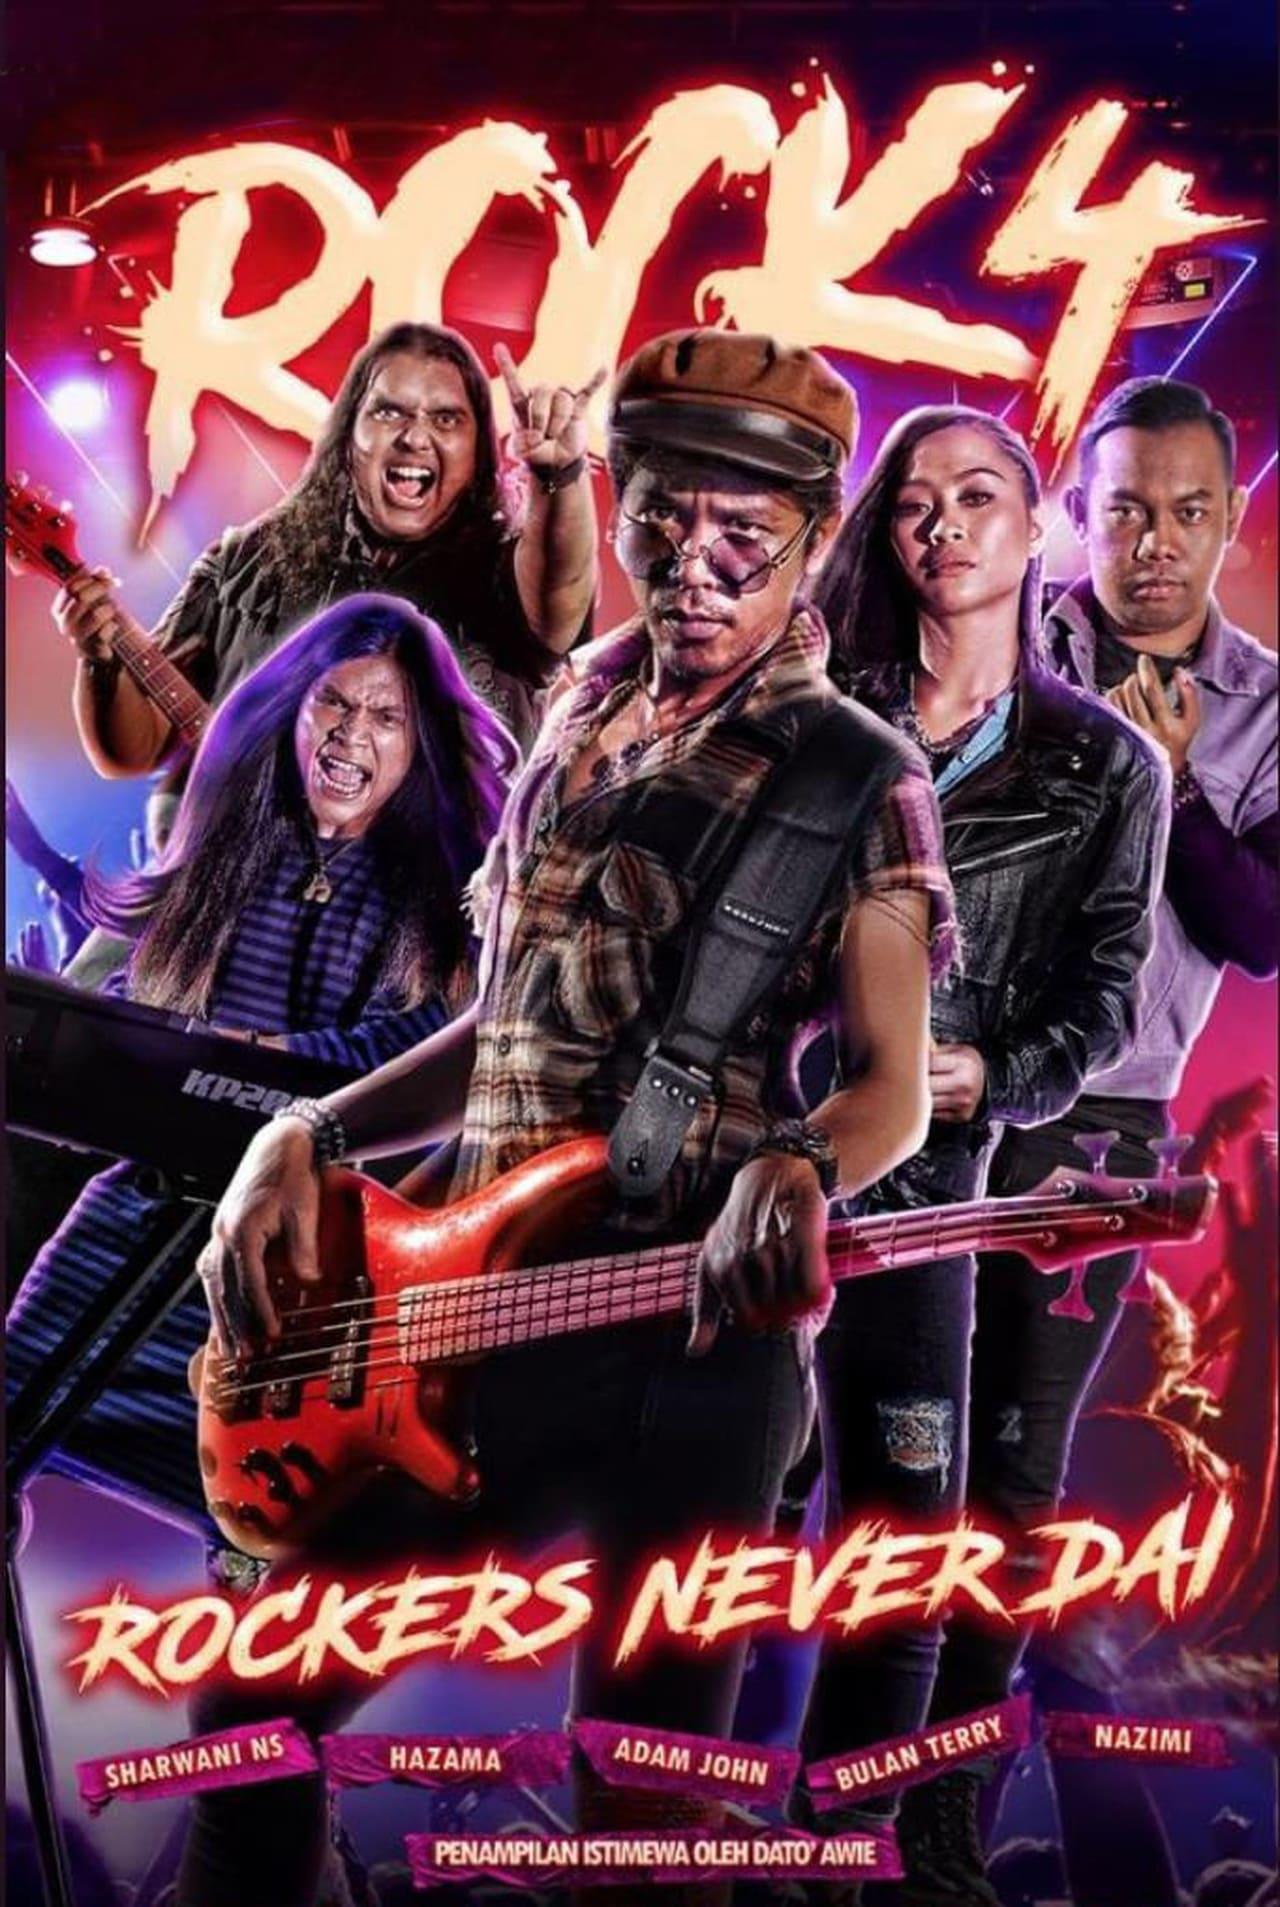 Rock 4: Rockers Never Dai (2020)